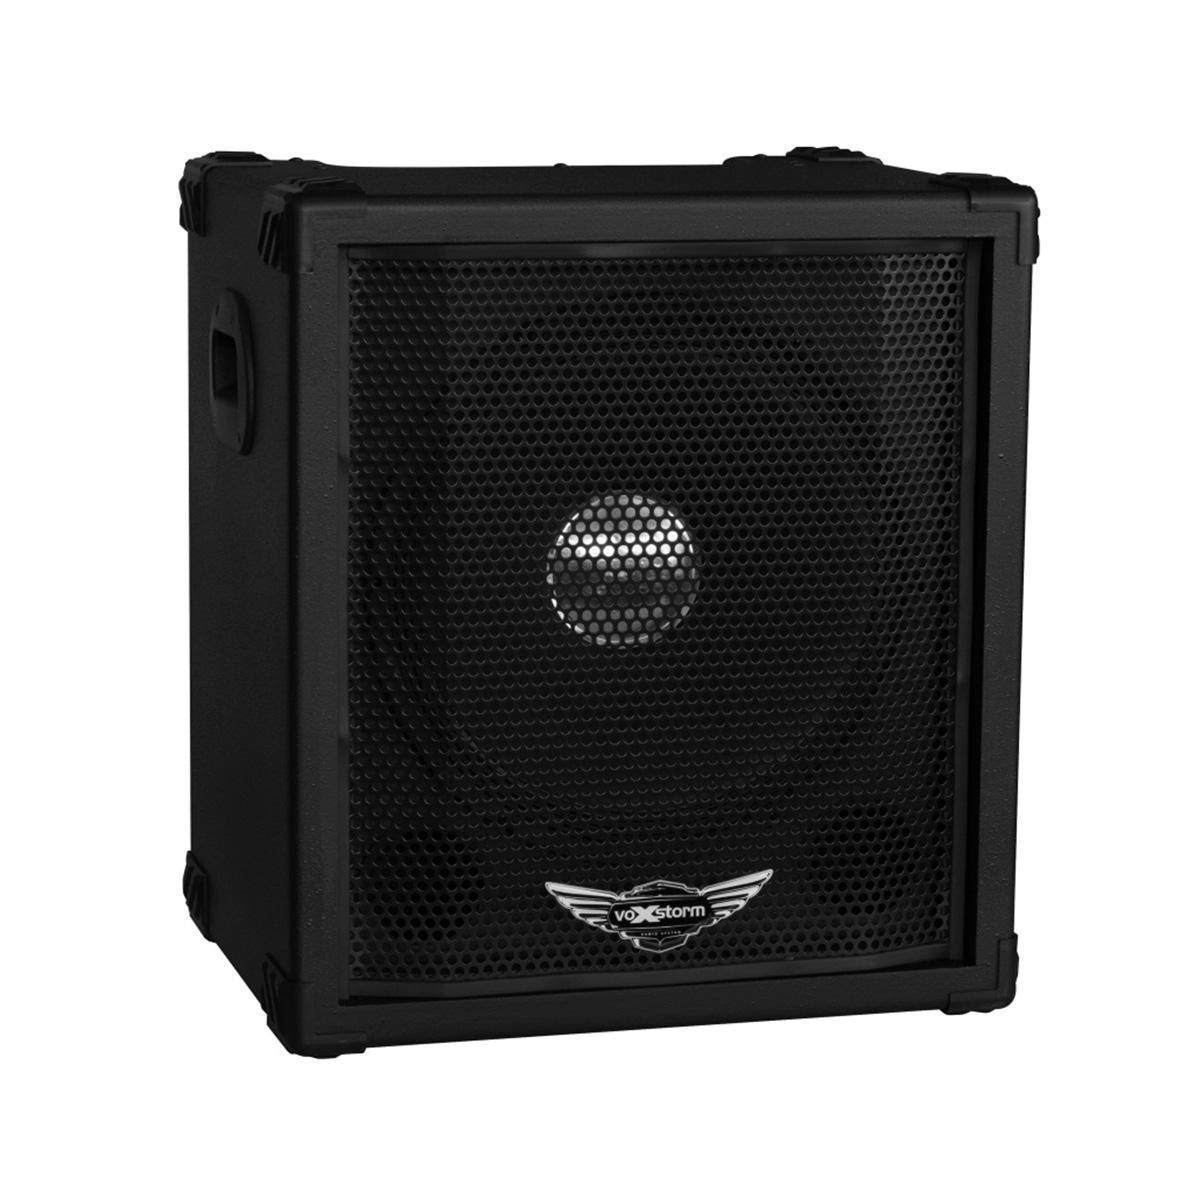 CB250 - Amplificador Combo p/ Contrabaixo 140W Top Bass CB 250 - Voxstorm